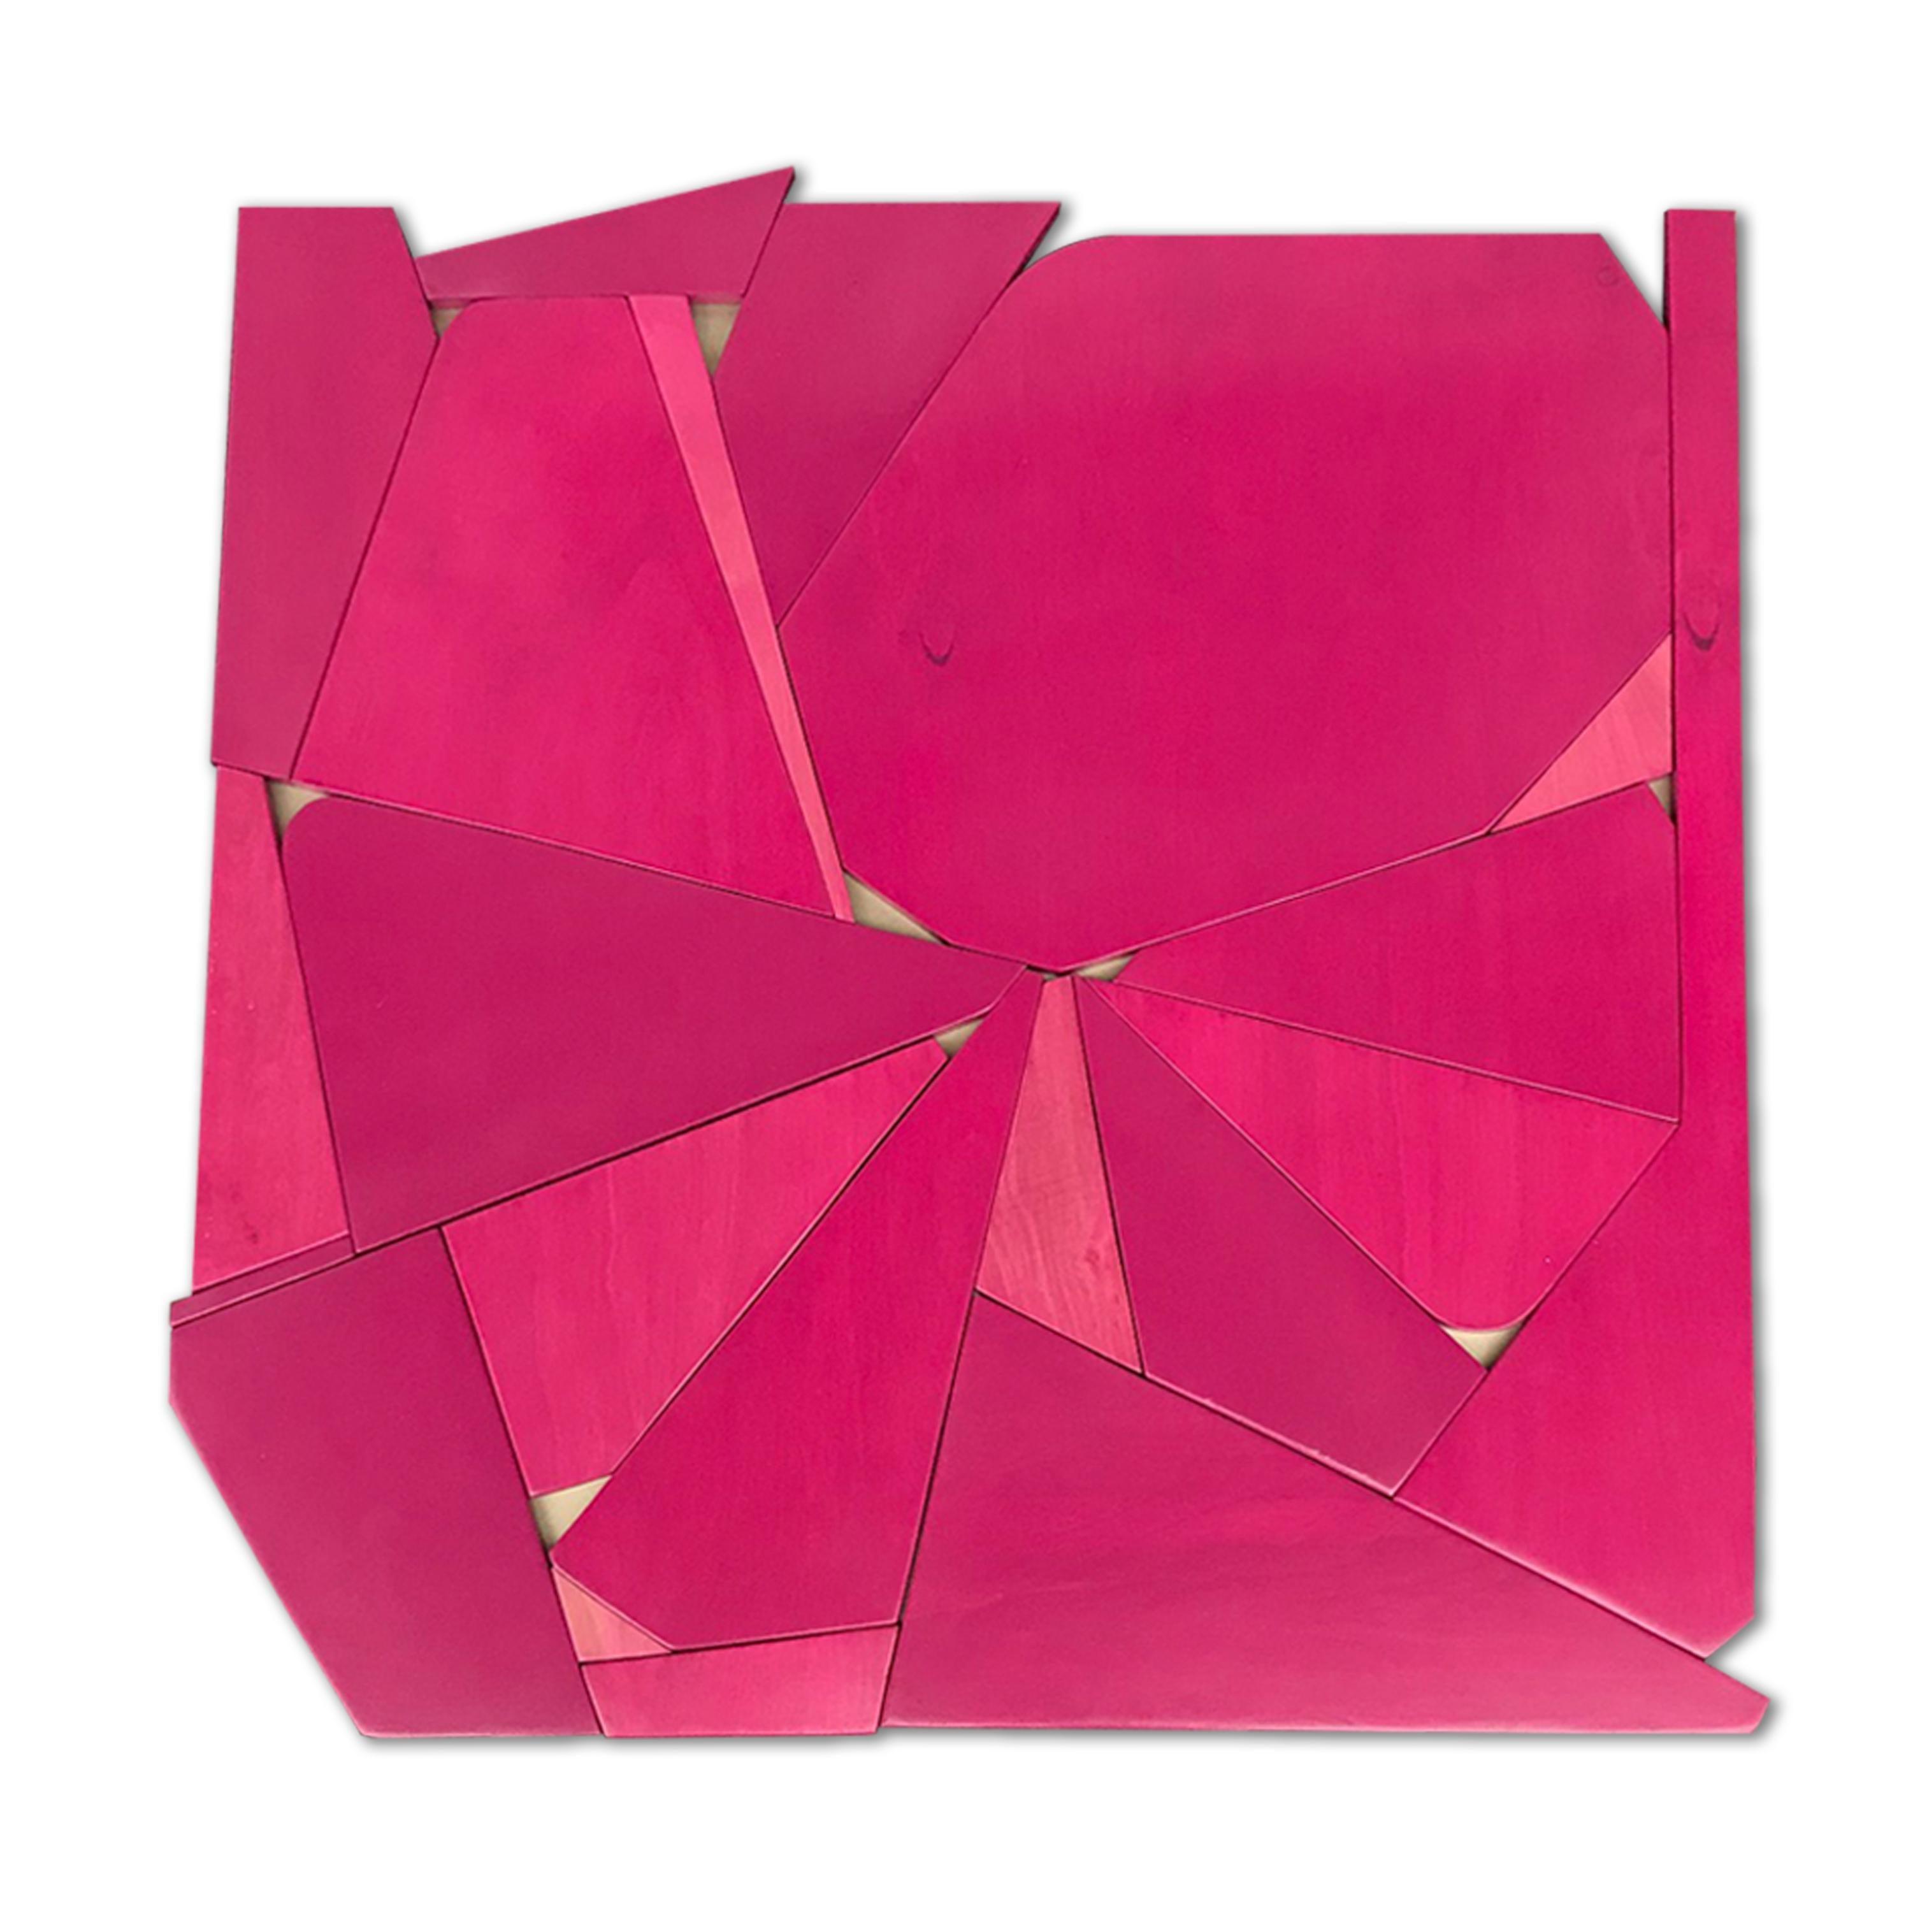 Pinwheel (mangenta modern abstract wall sculpture minimal geometric design pink)